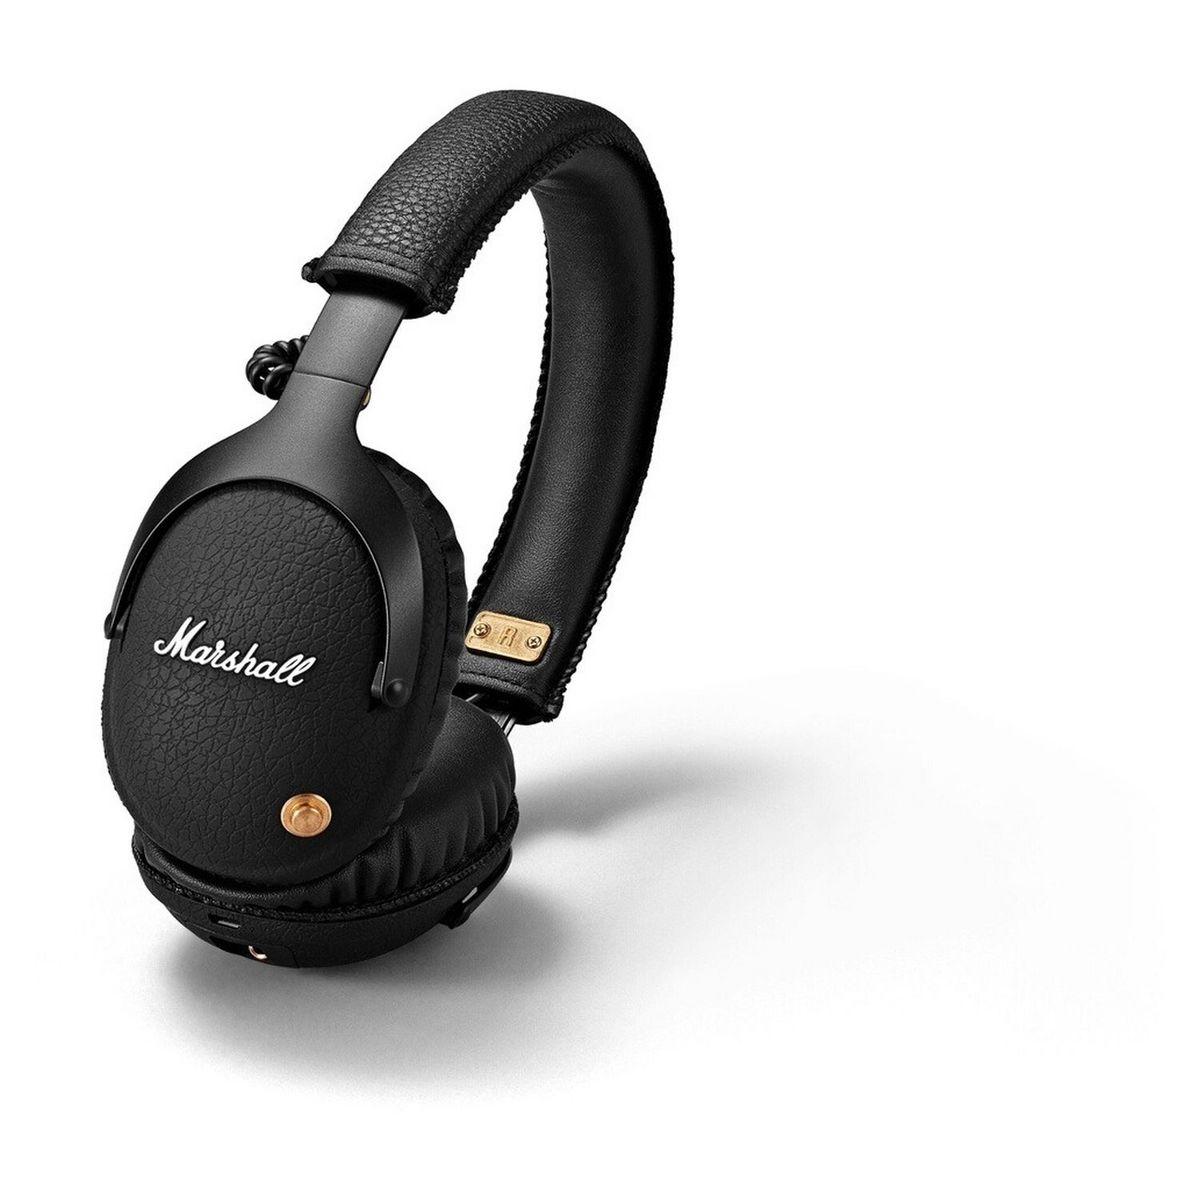 Casque audio Bluetooth Monitor BT - Noir